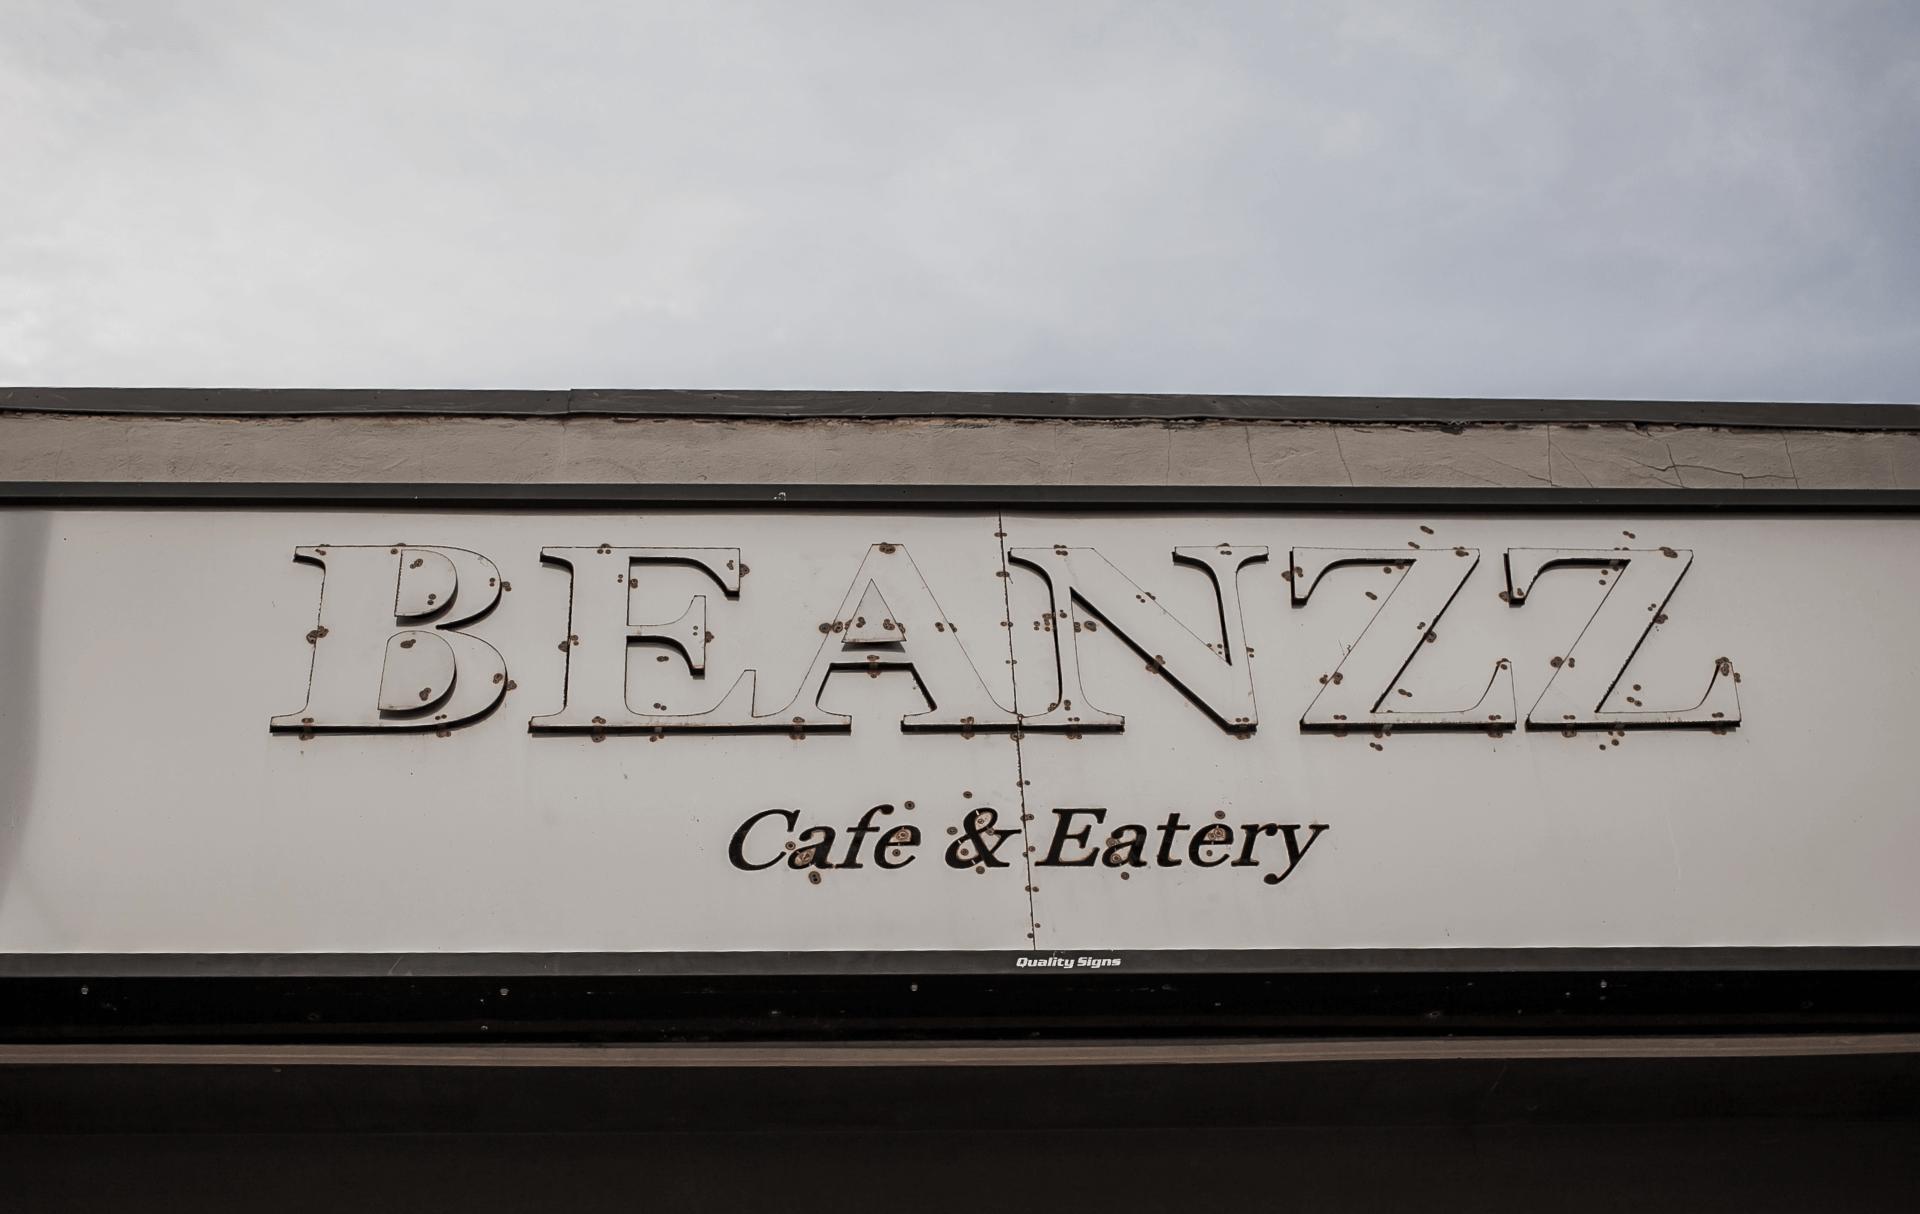 exterior cafe sign